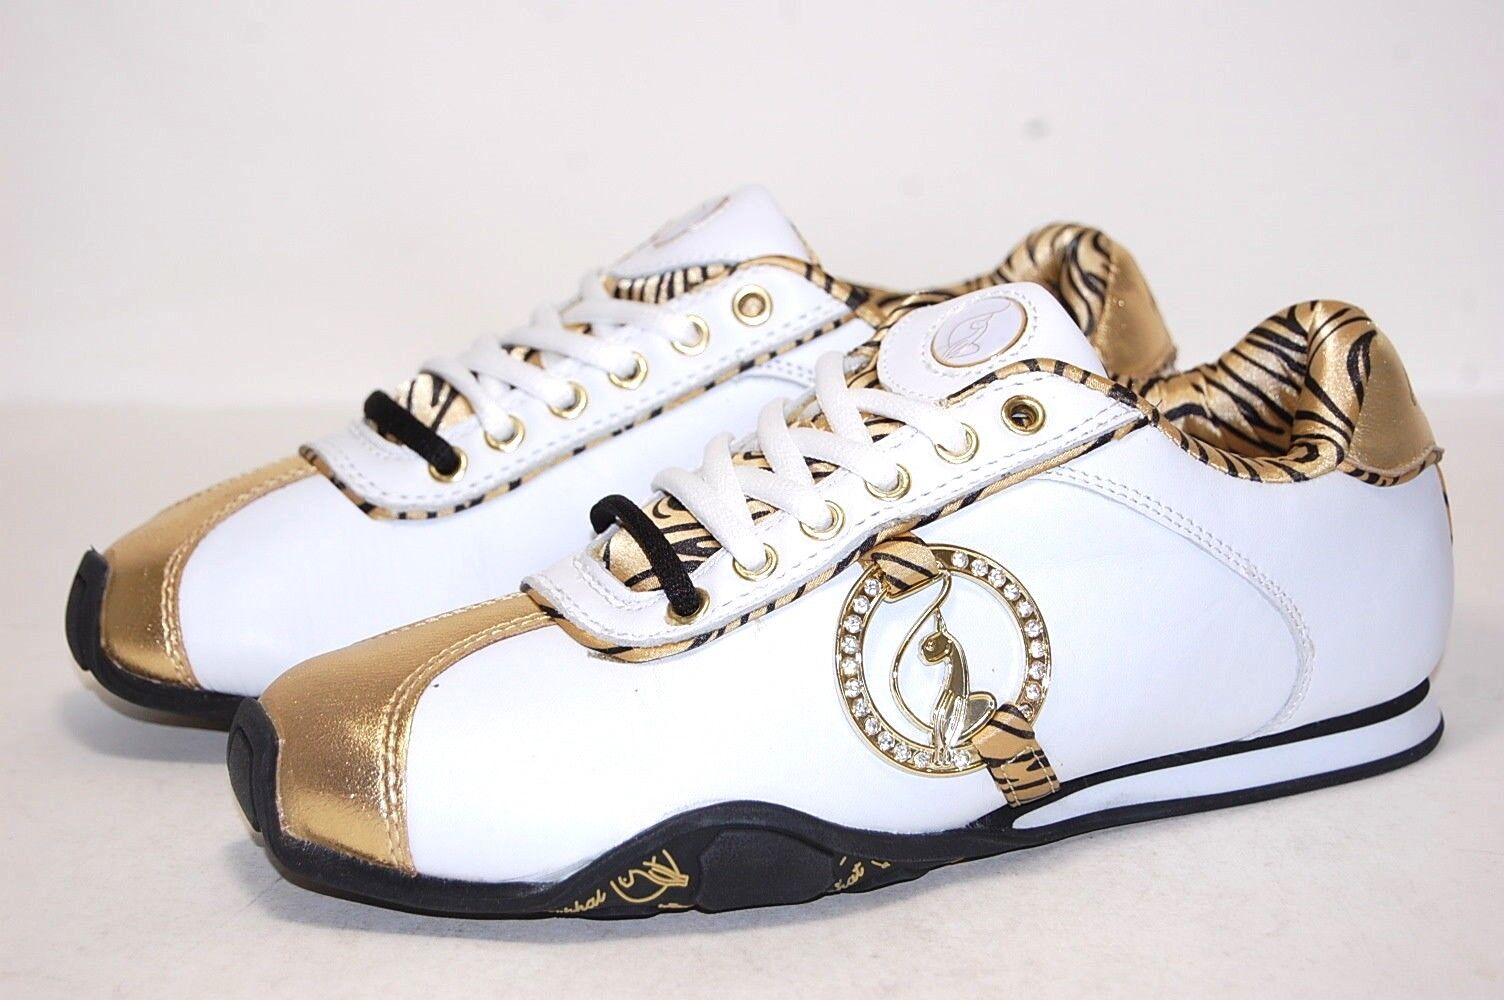 Baby Phat Hoop Zibra Dia Lolita BP51205A Gold Zibra Hoop Classic Schuhes Damens adf96b